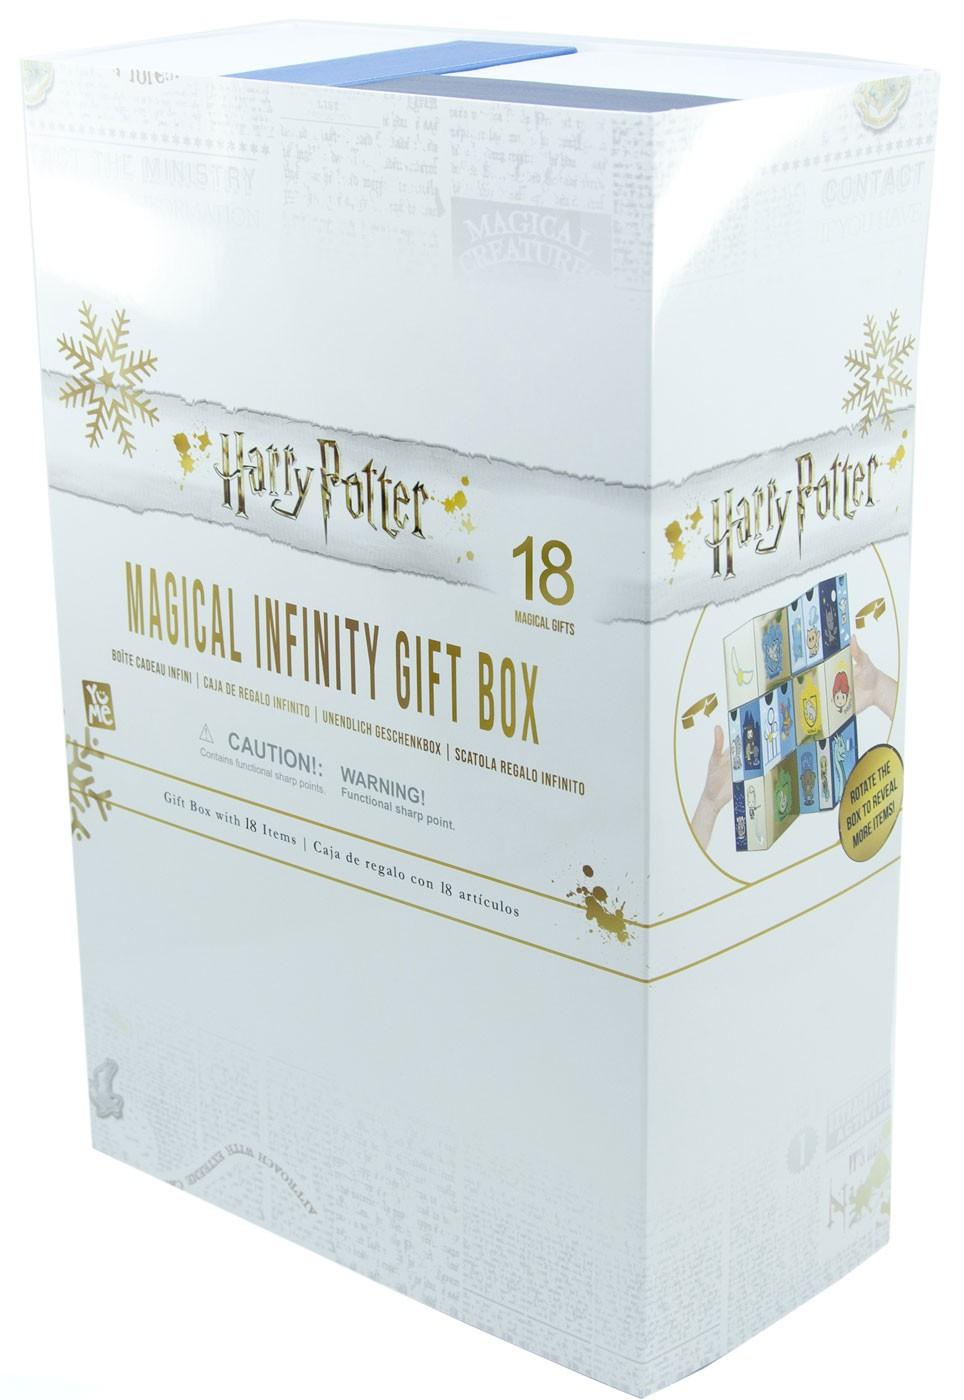 Harry Potter Magical Infinity Gift Box 843309191358 Ebay